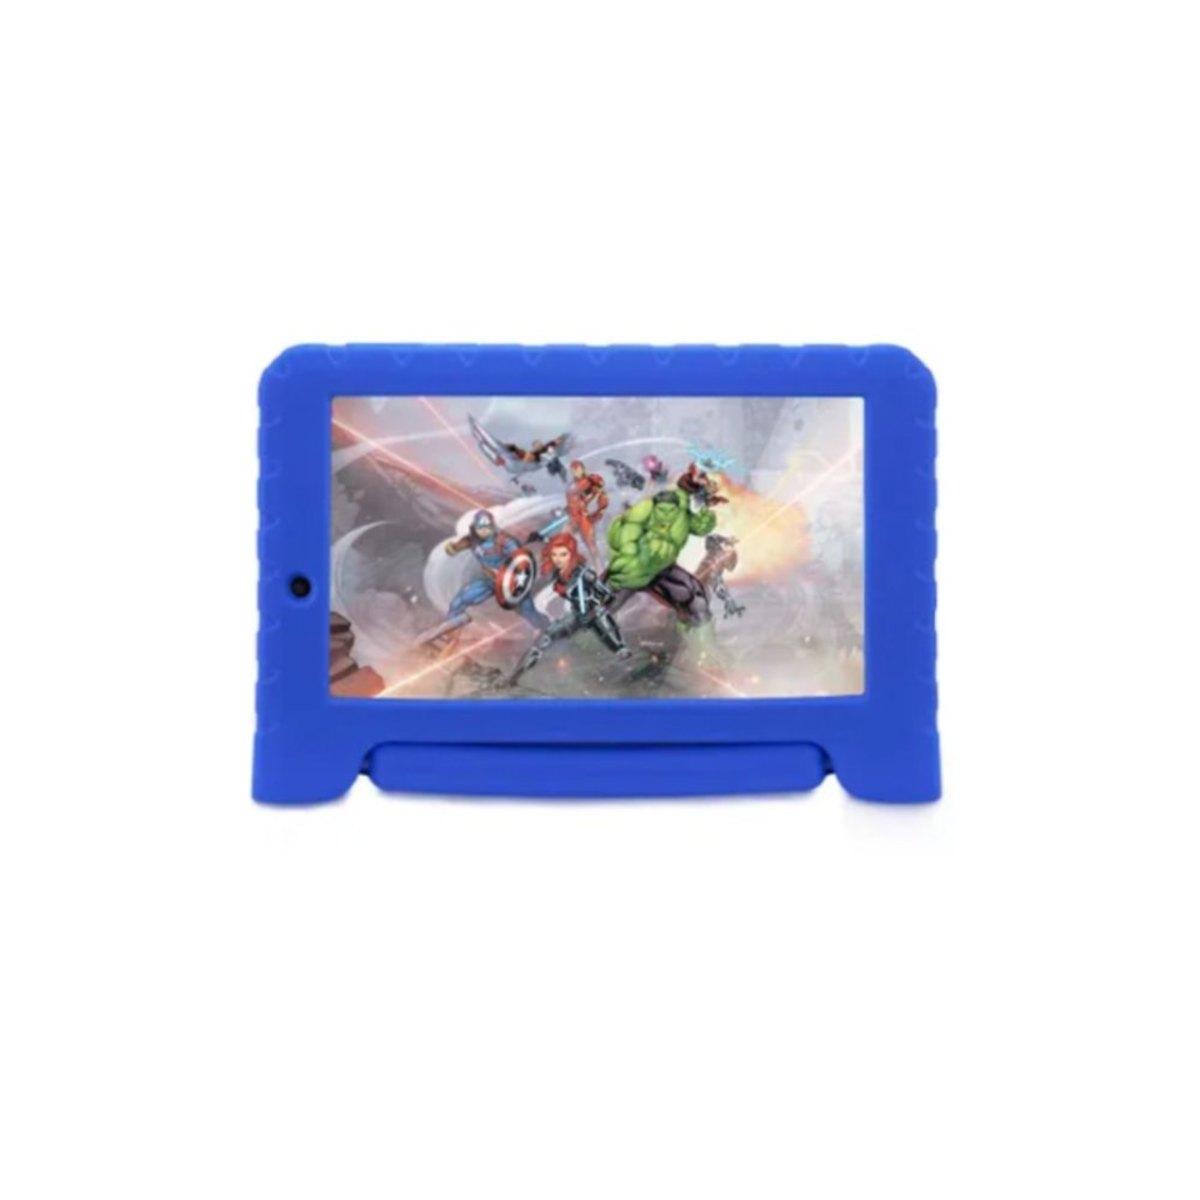 Tablet Multilaser Disney Vingadores Plus Nb307 Azul 16gb Wi-fi